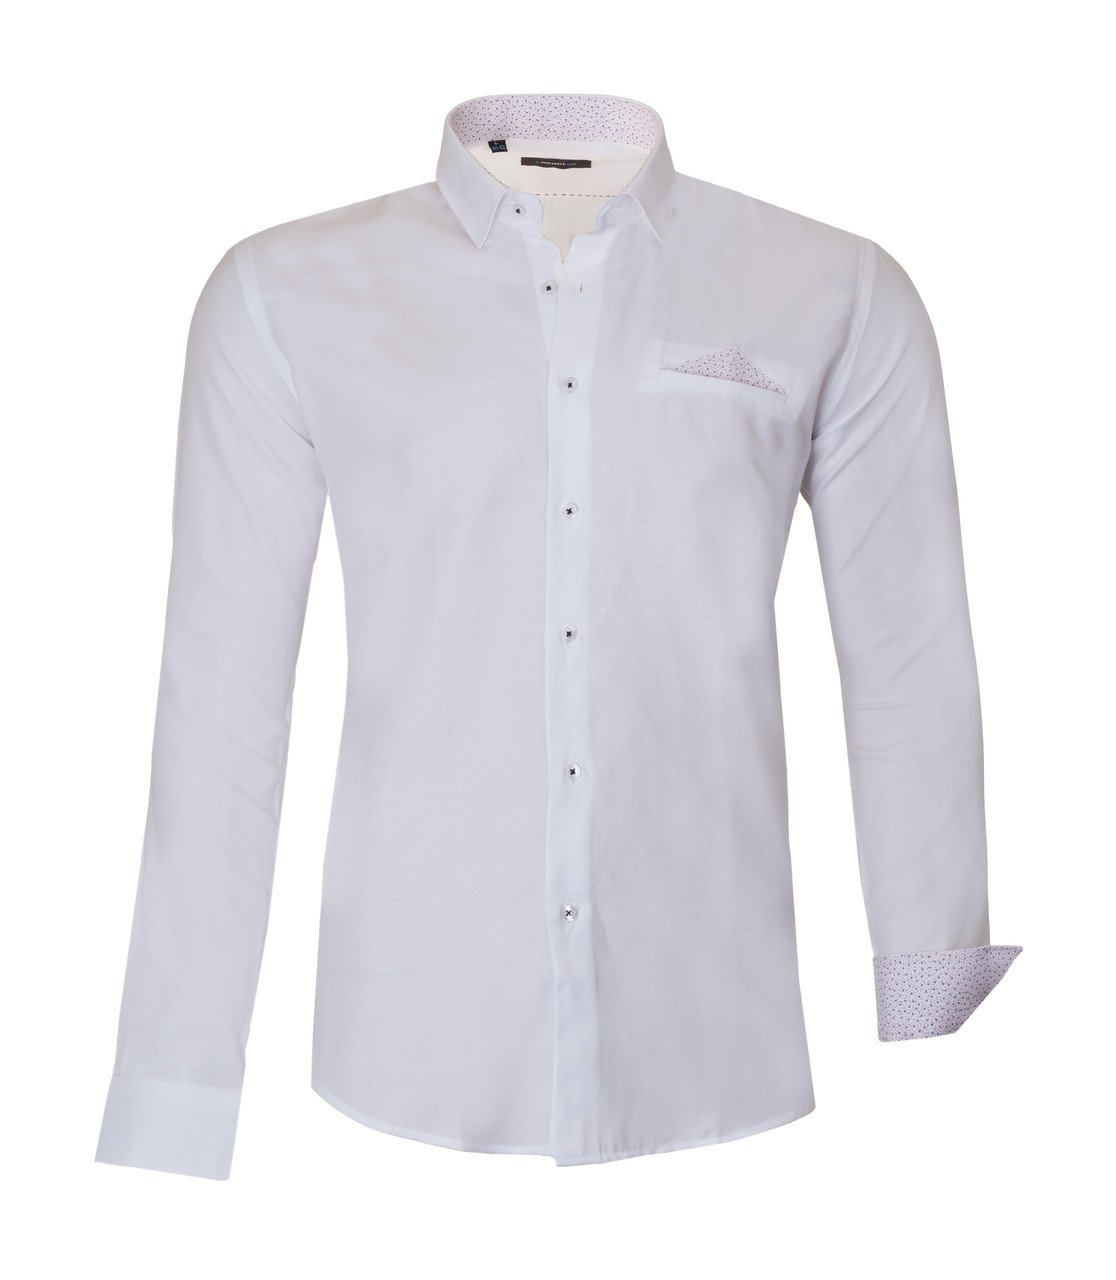 Рубашка мужская TOM Белая KS1620-1